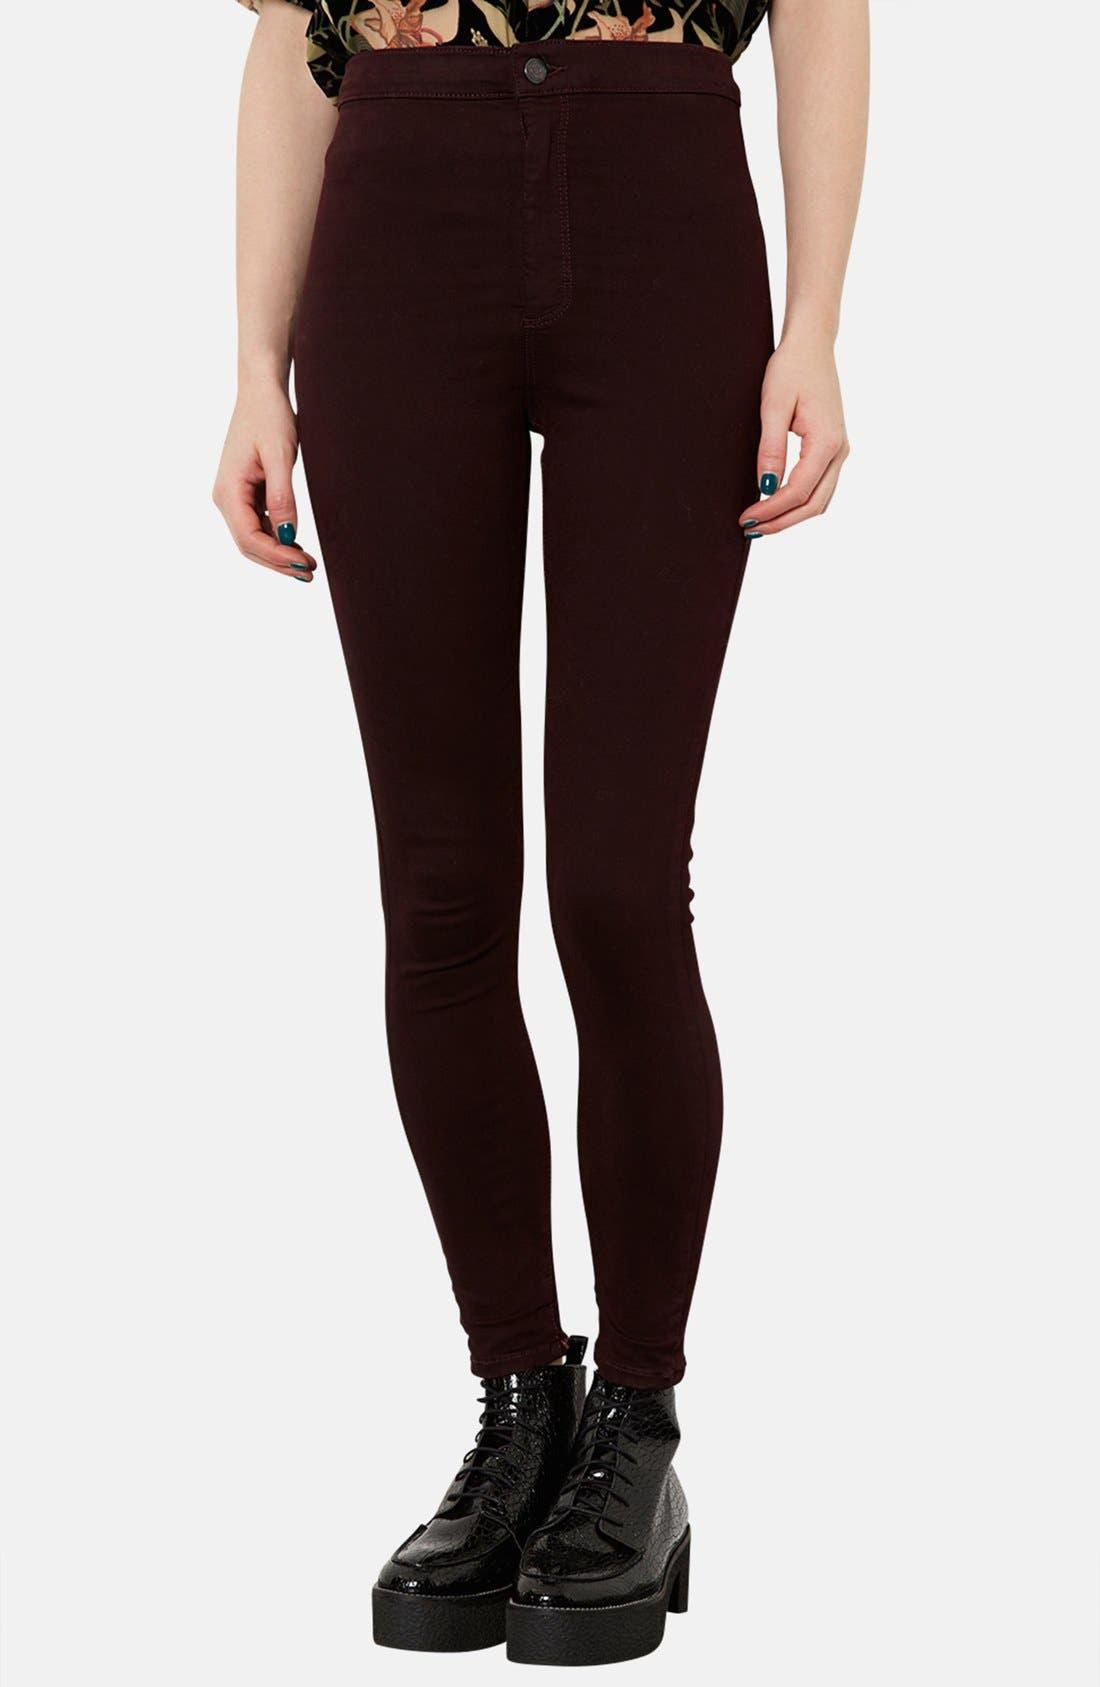 Alternate Image 1 Selected - Topshop Moto 'Joni' High Rise Skinny Jeans (Burgundy)